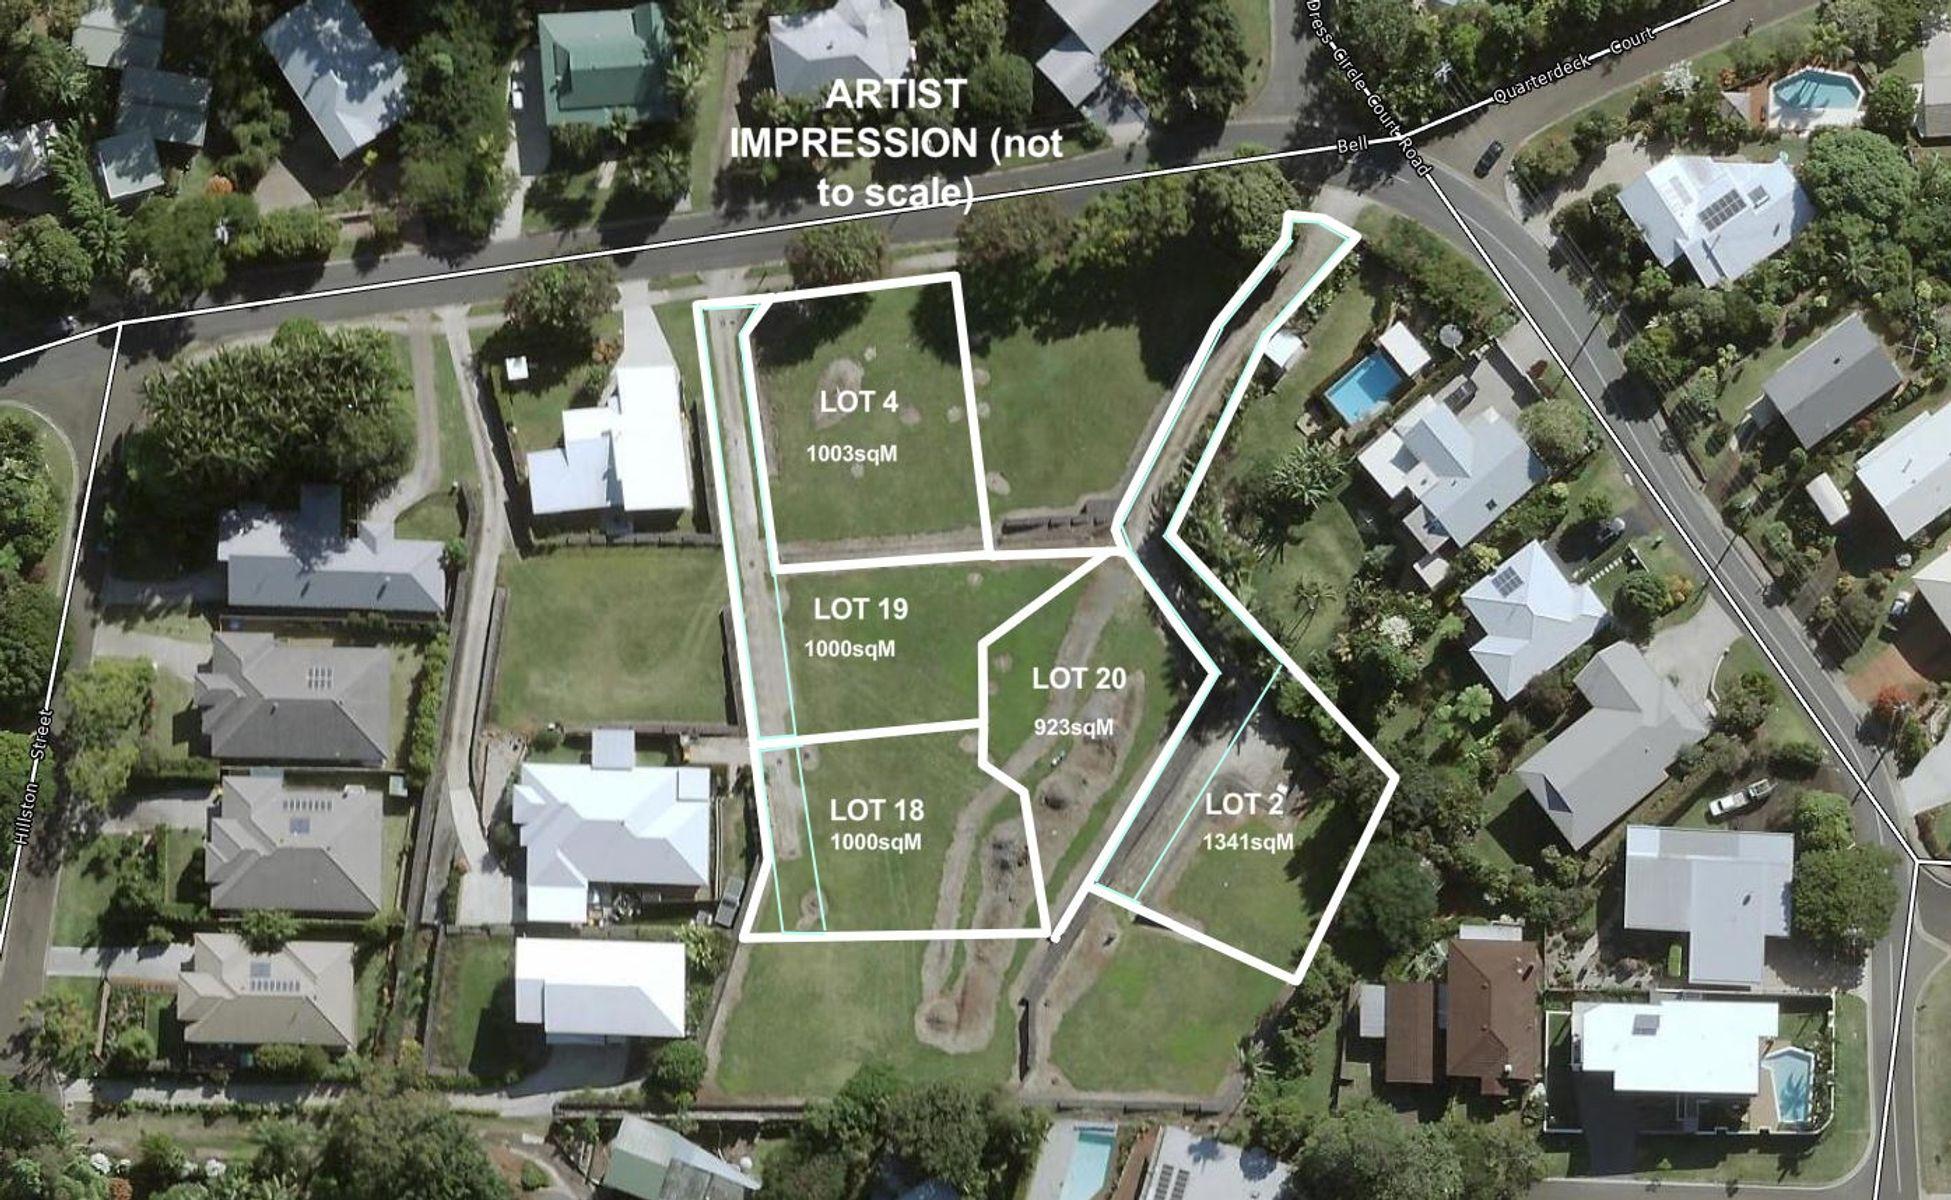 33-43 Bell Road, Buderim, QLD 4556